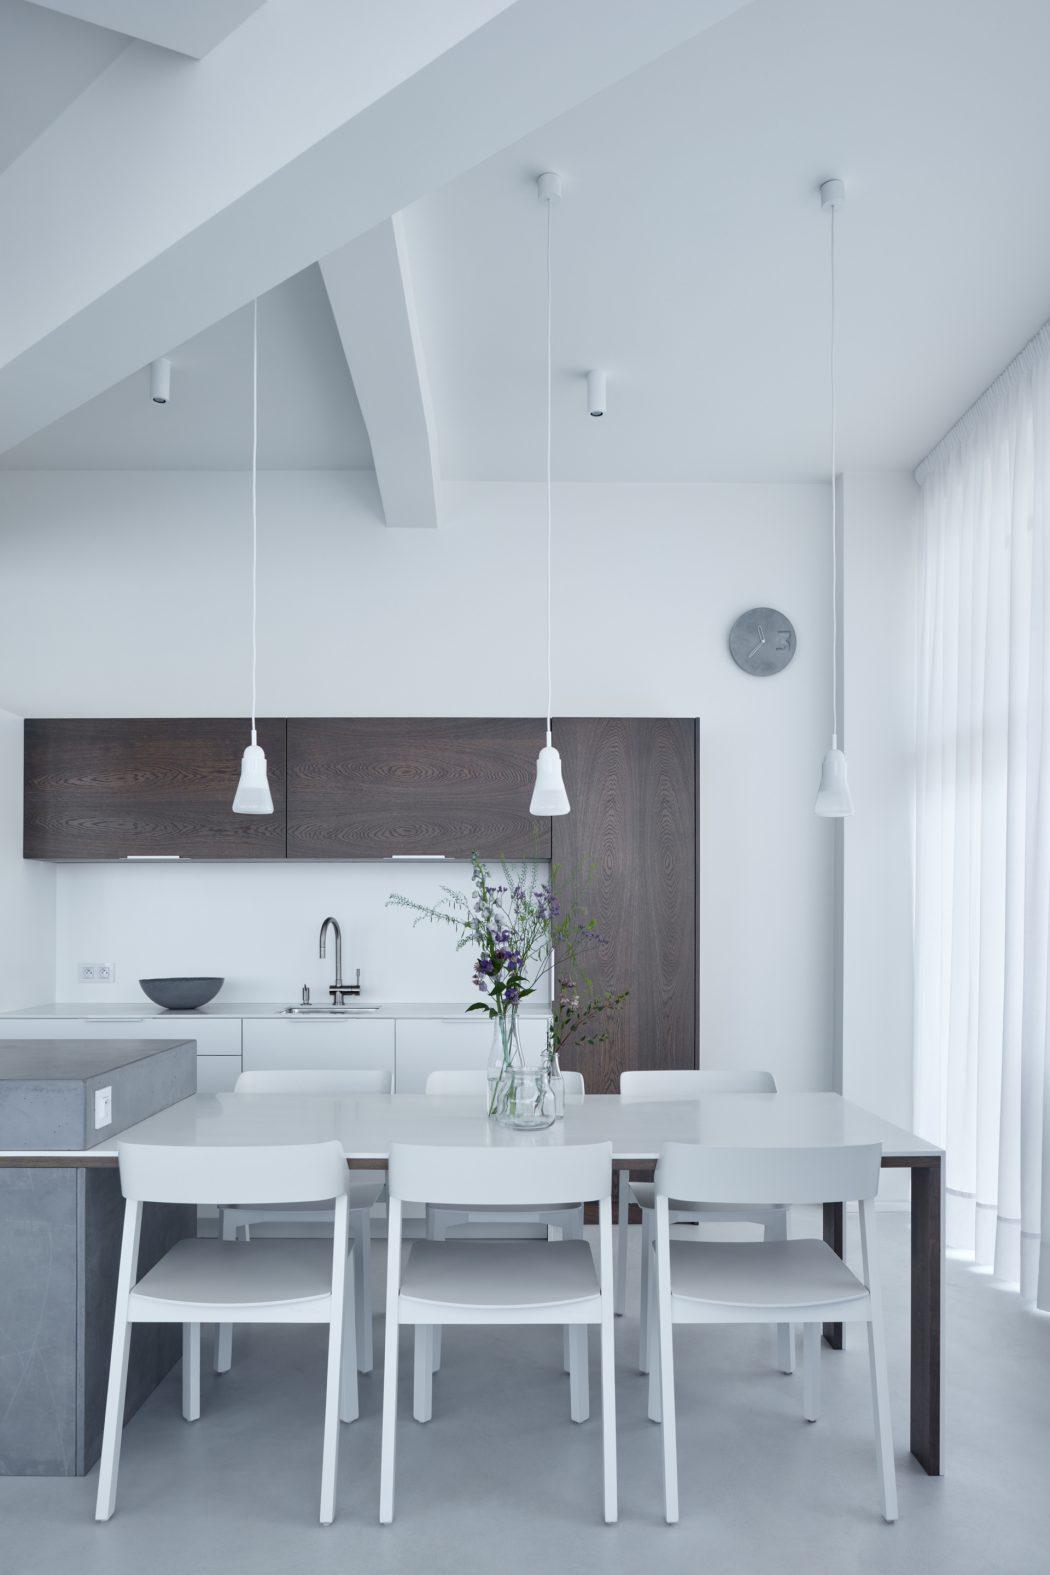 007-loft-f504-smlxl-studio-1050x1575